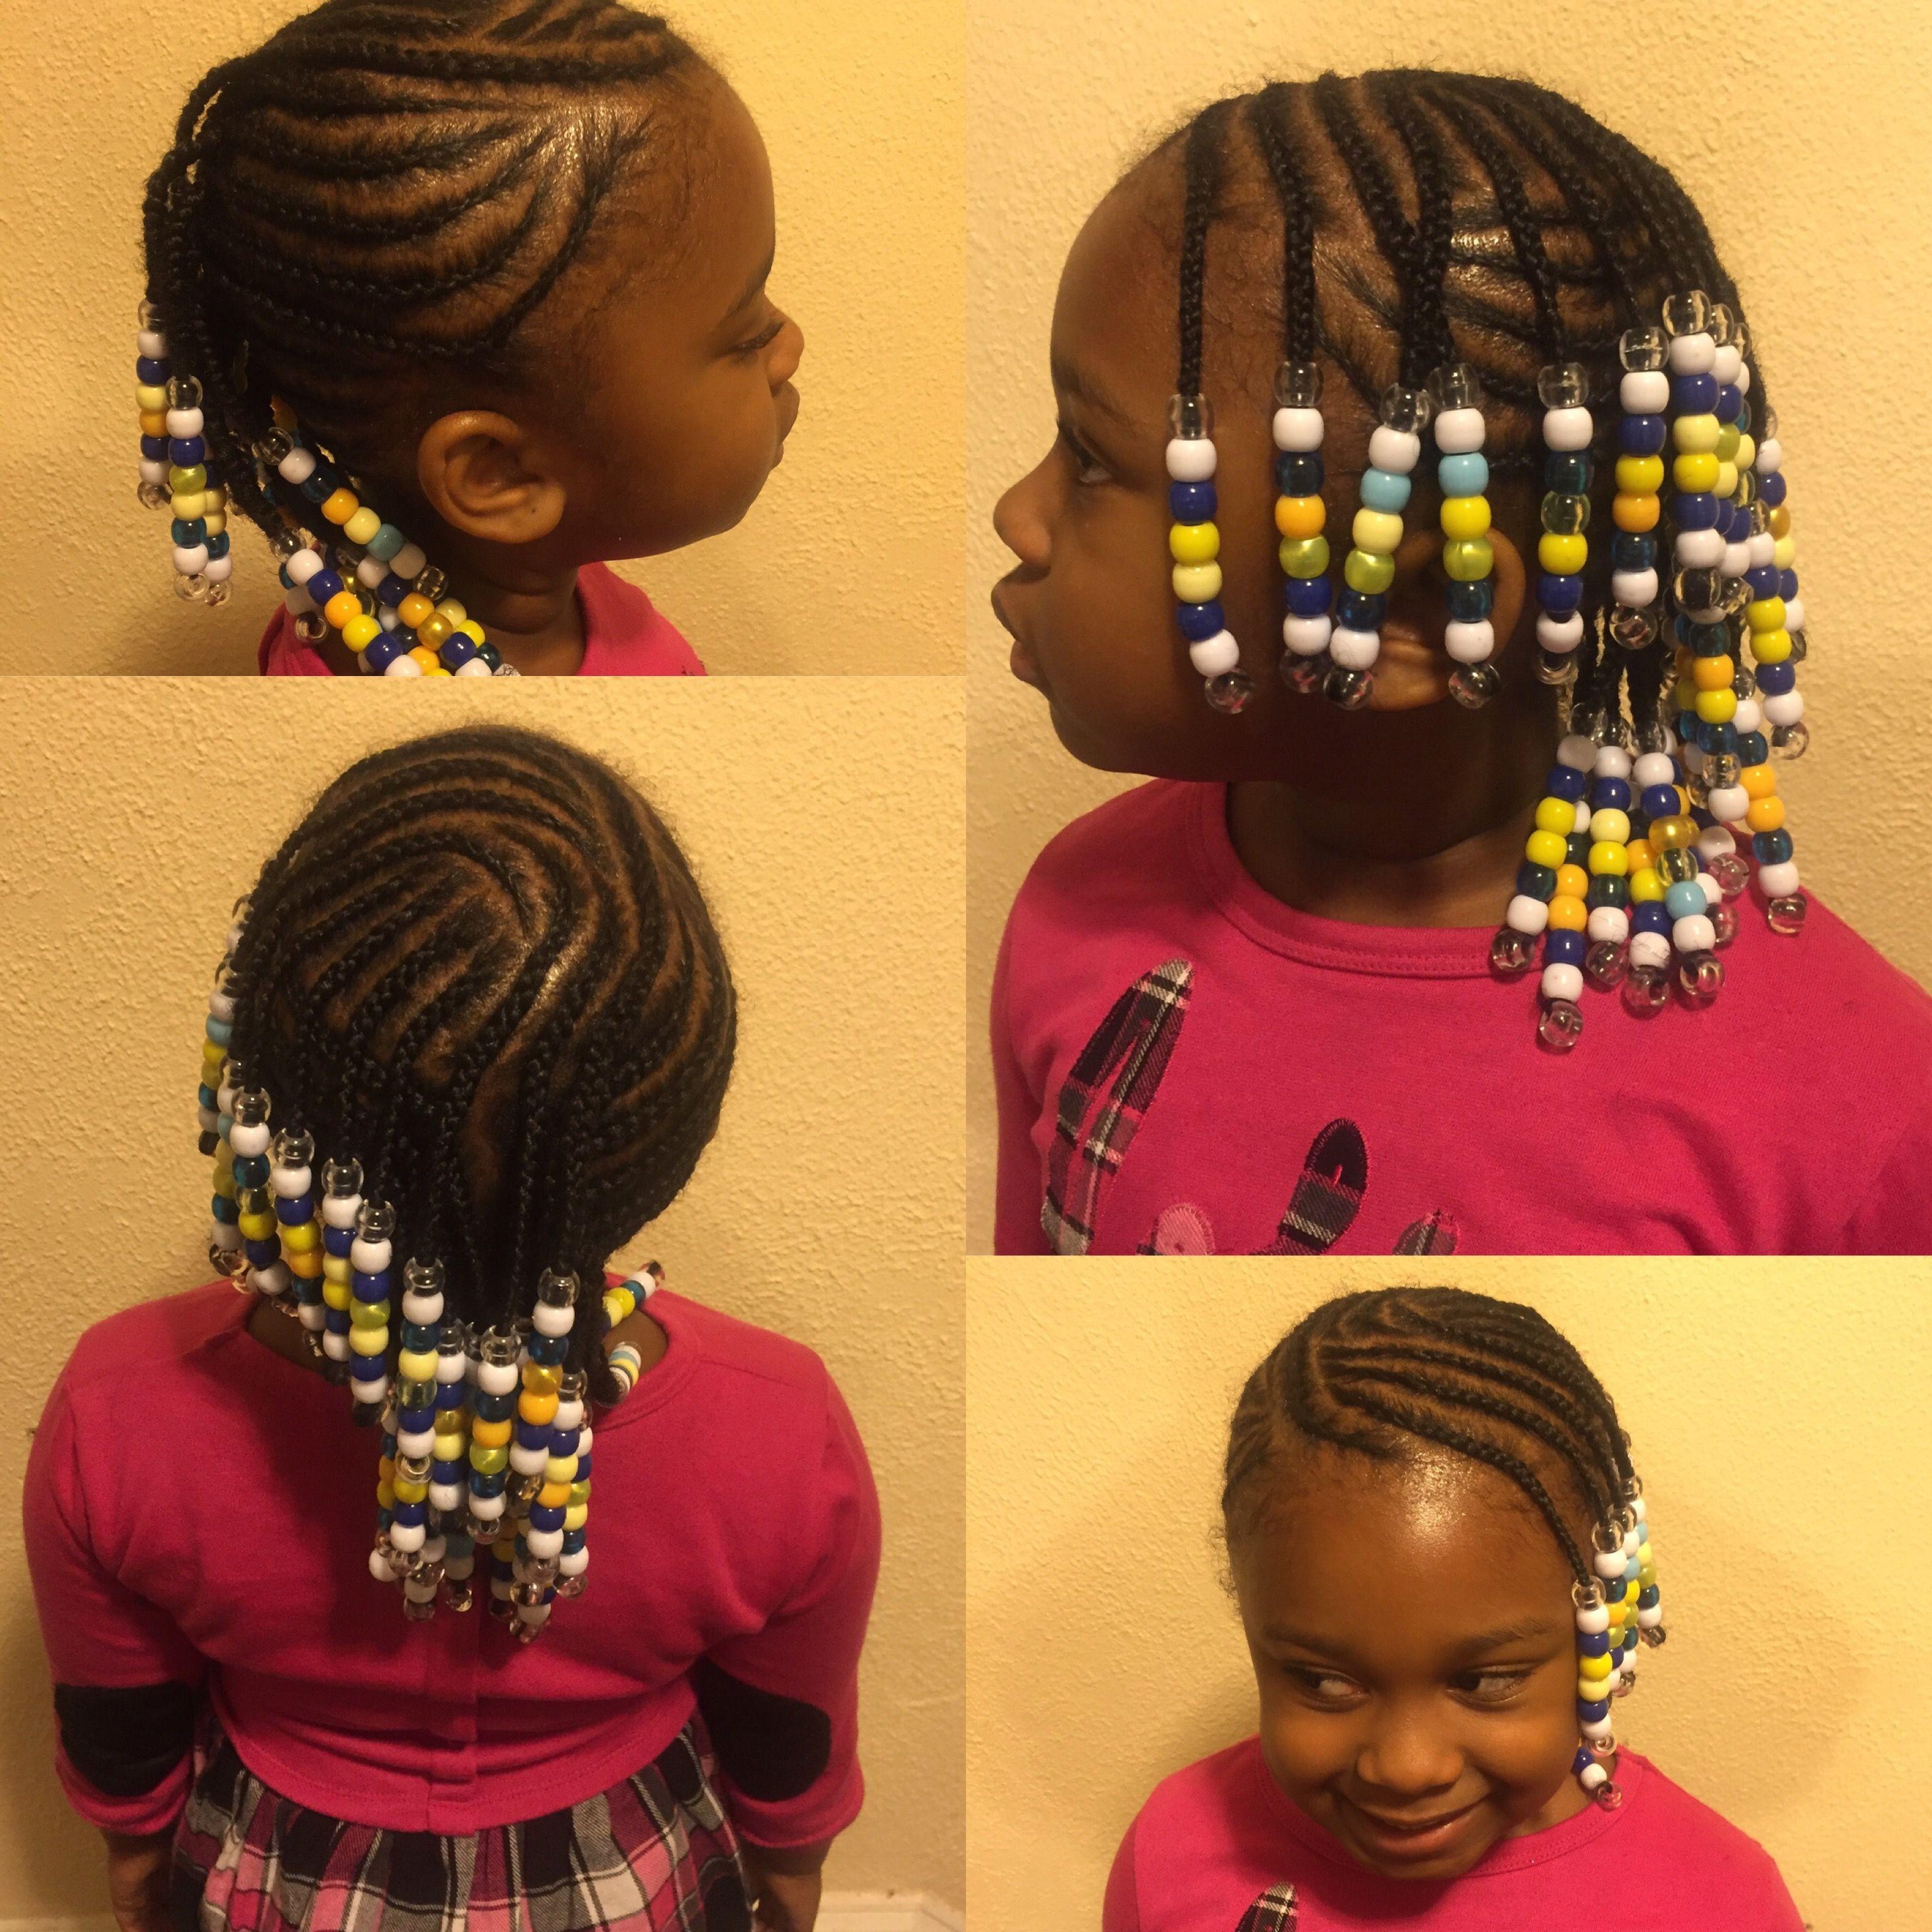 Pin by BeauTyy✨ on Kids Braided Styles   Kid braid styles, Braids ...